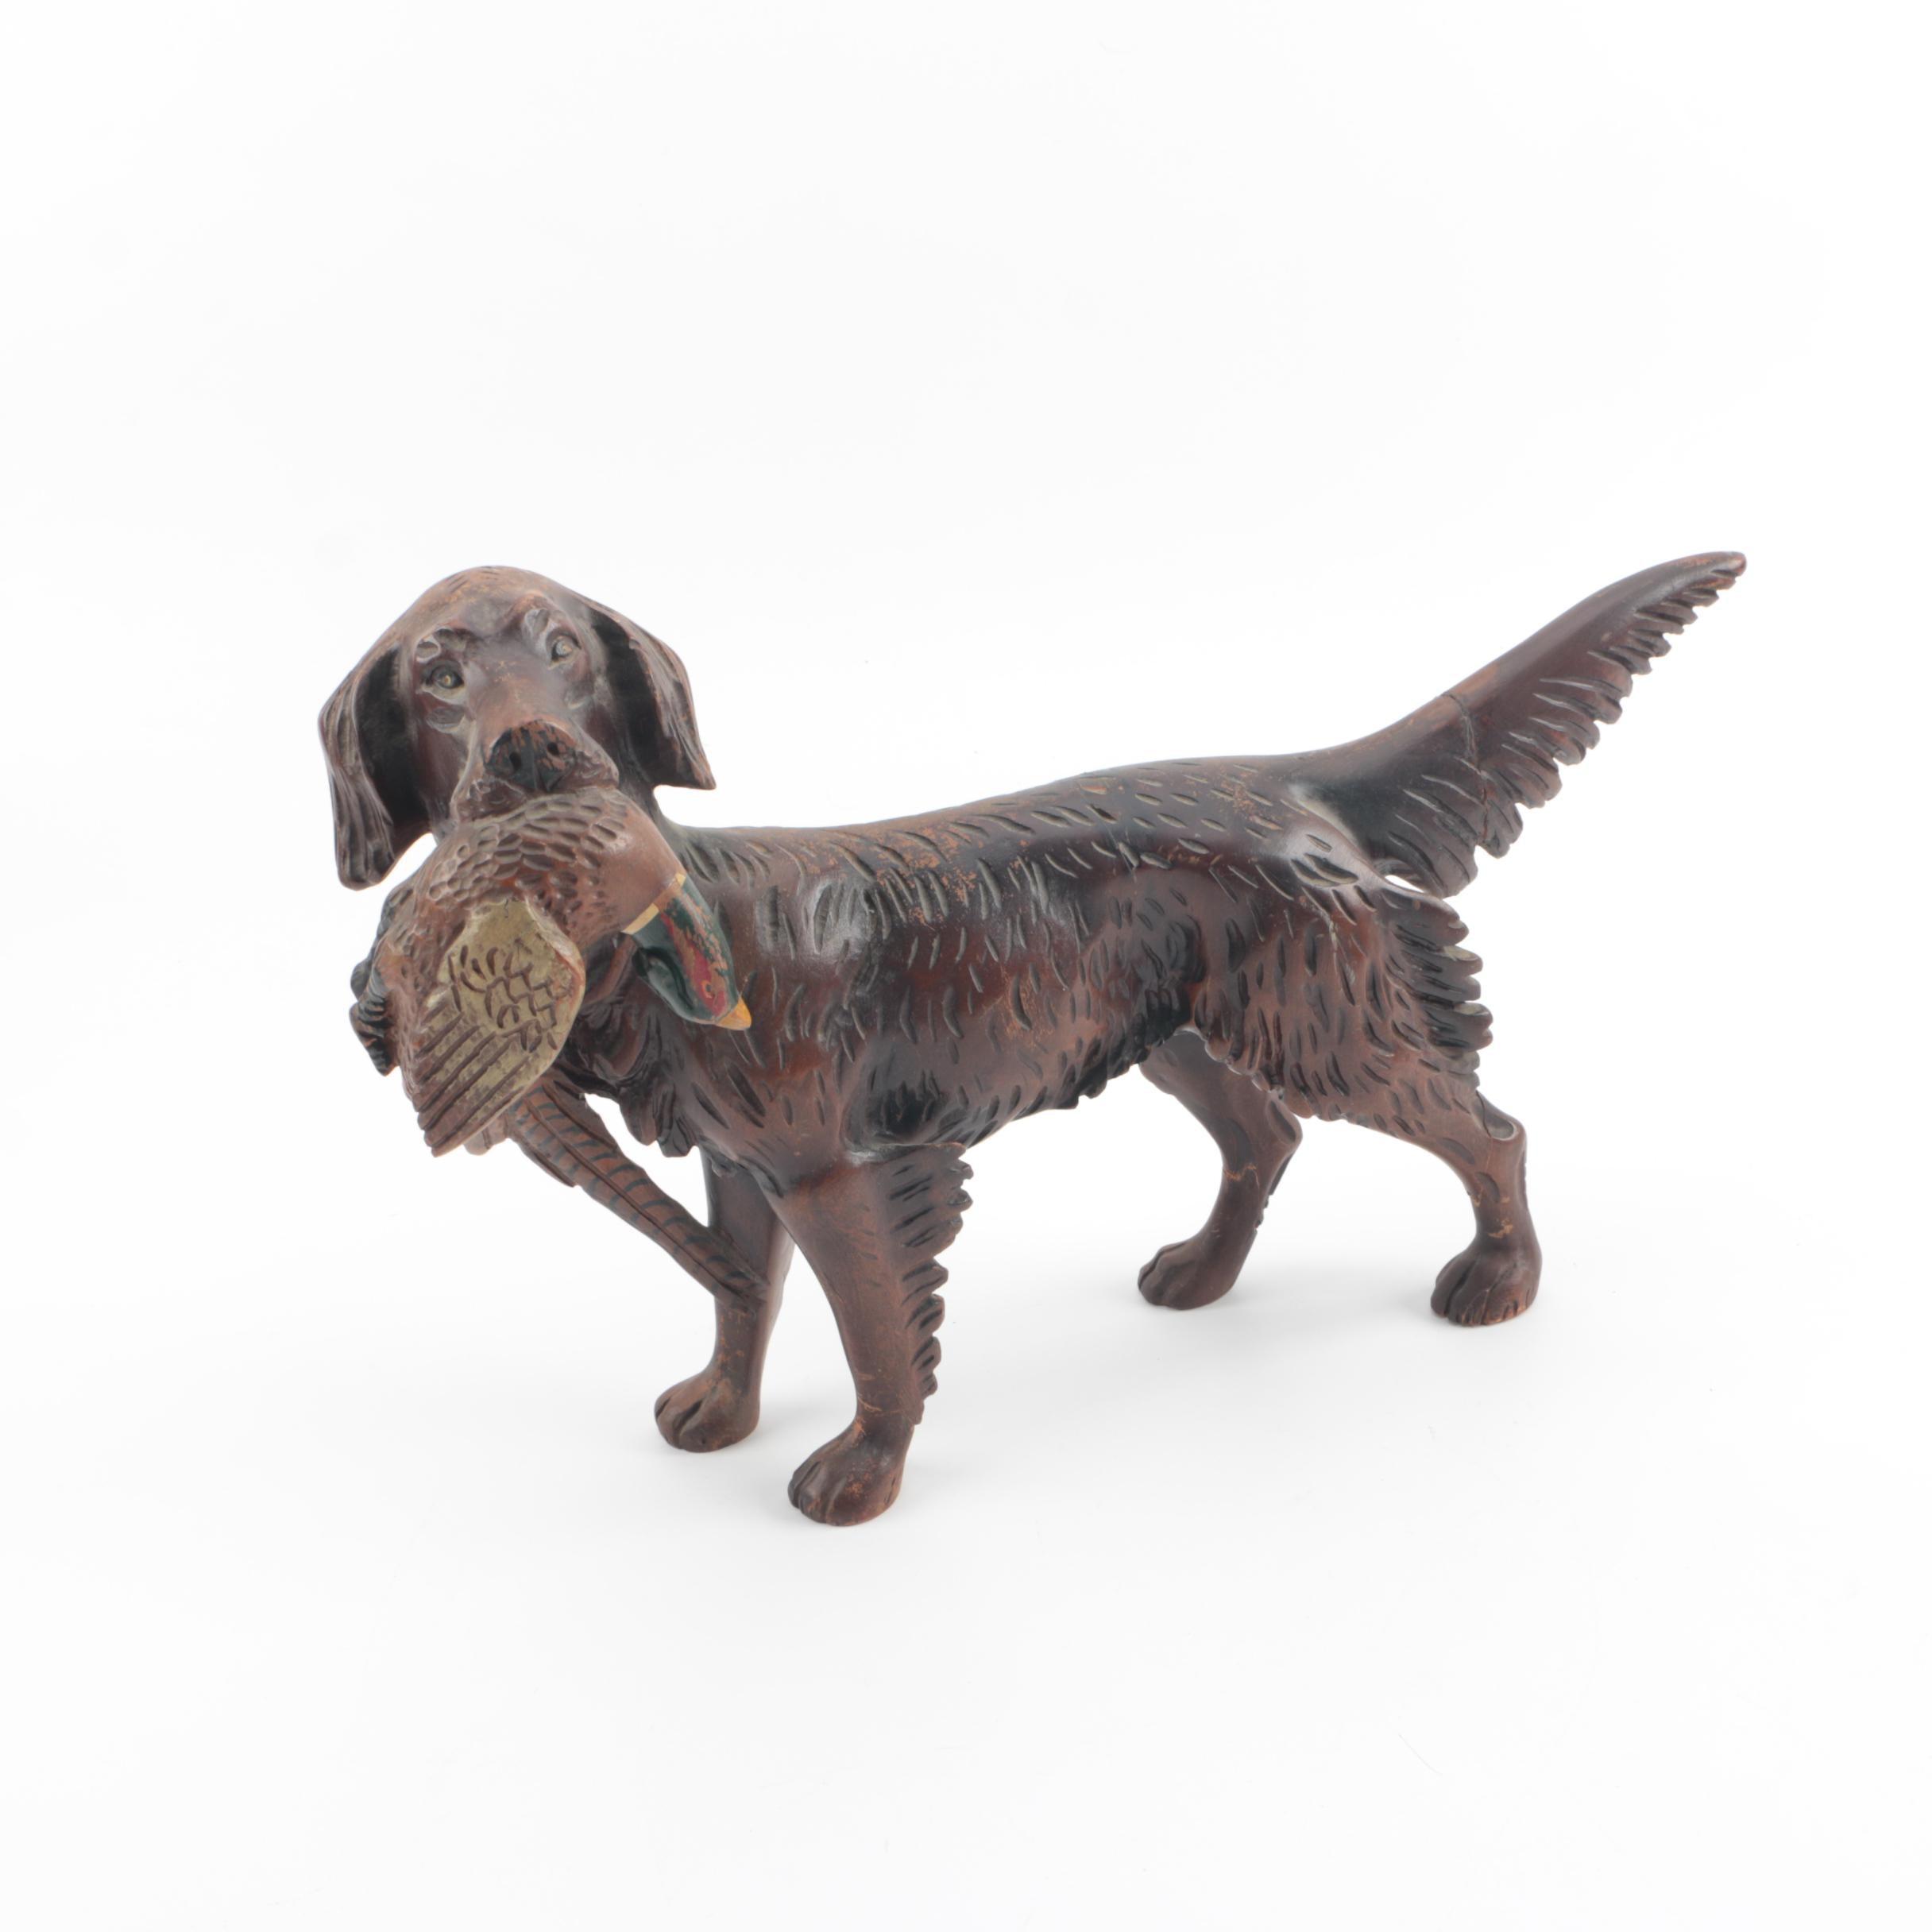 Carved Wood Hunting Dog Sculpture